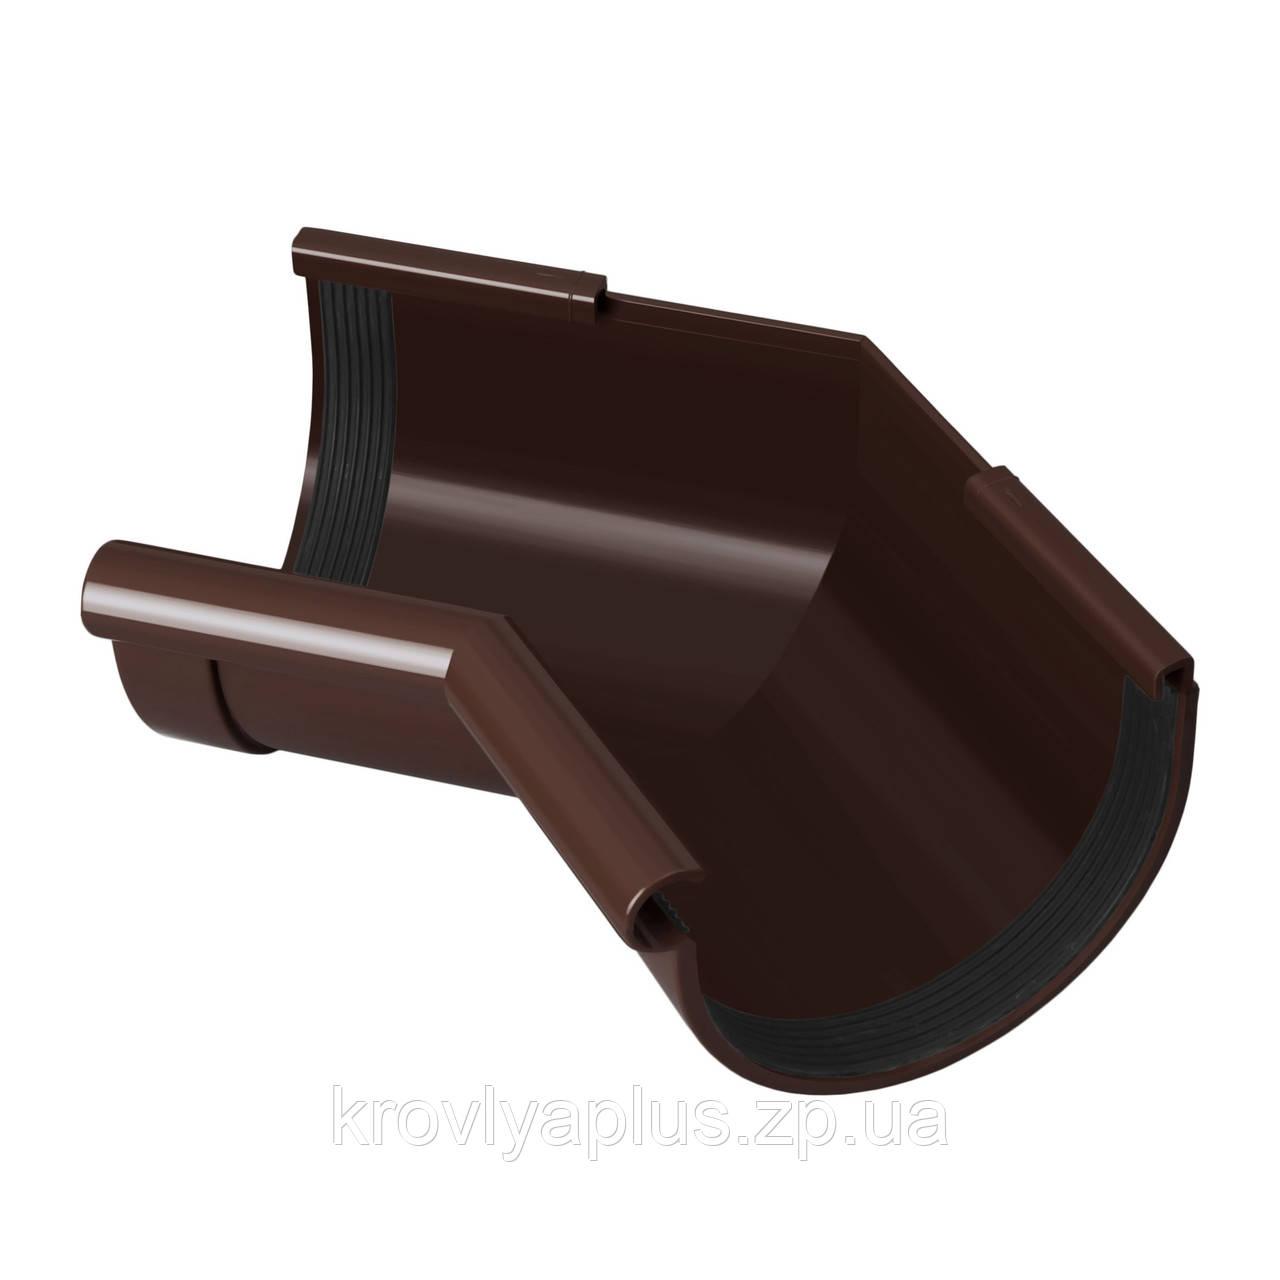 Угол (поворот) желоба внутренний 135° Ø130 (Rainway, Украина), коричневая.